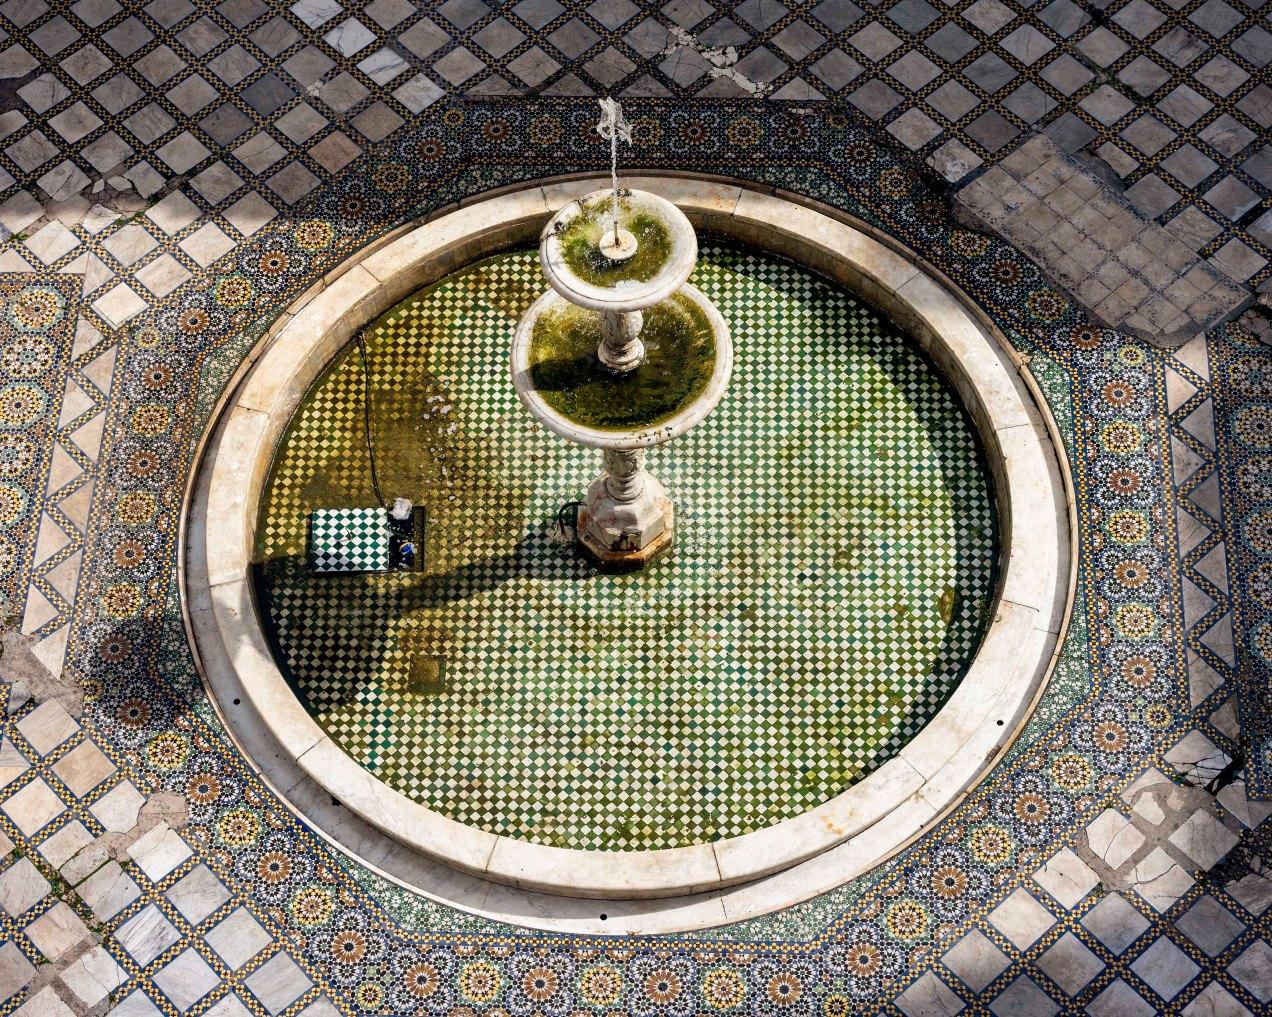 Fontaine du Palais Moulay Idriss, Fès, gildalliere, 2020 Maroc